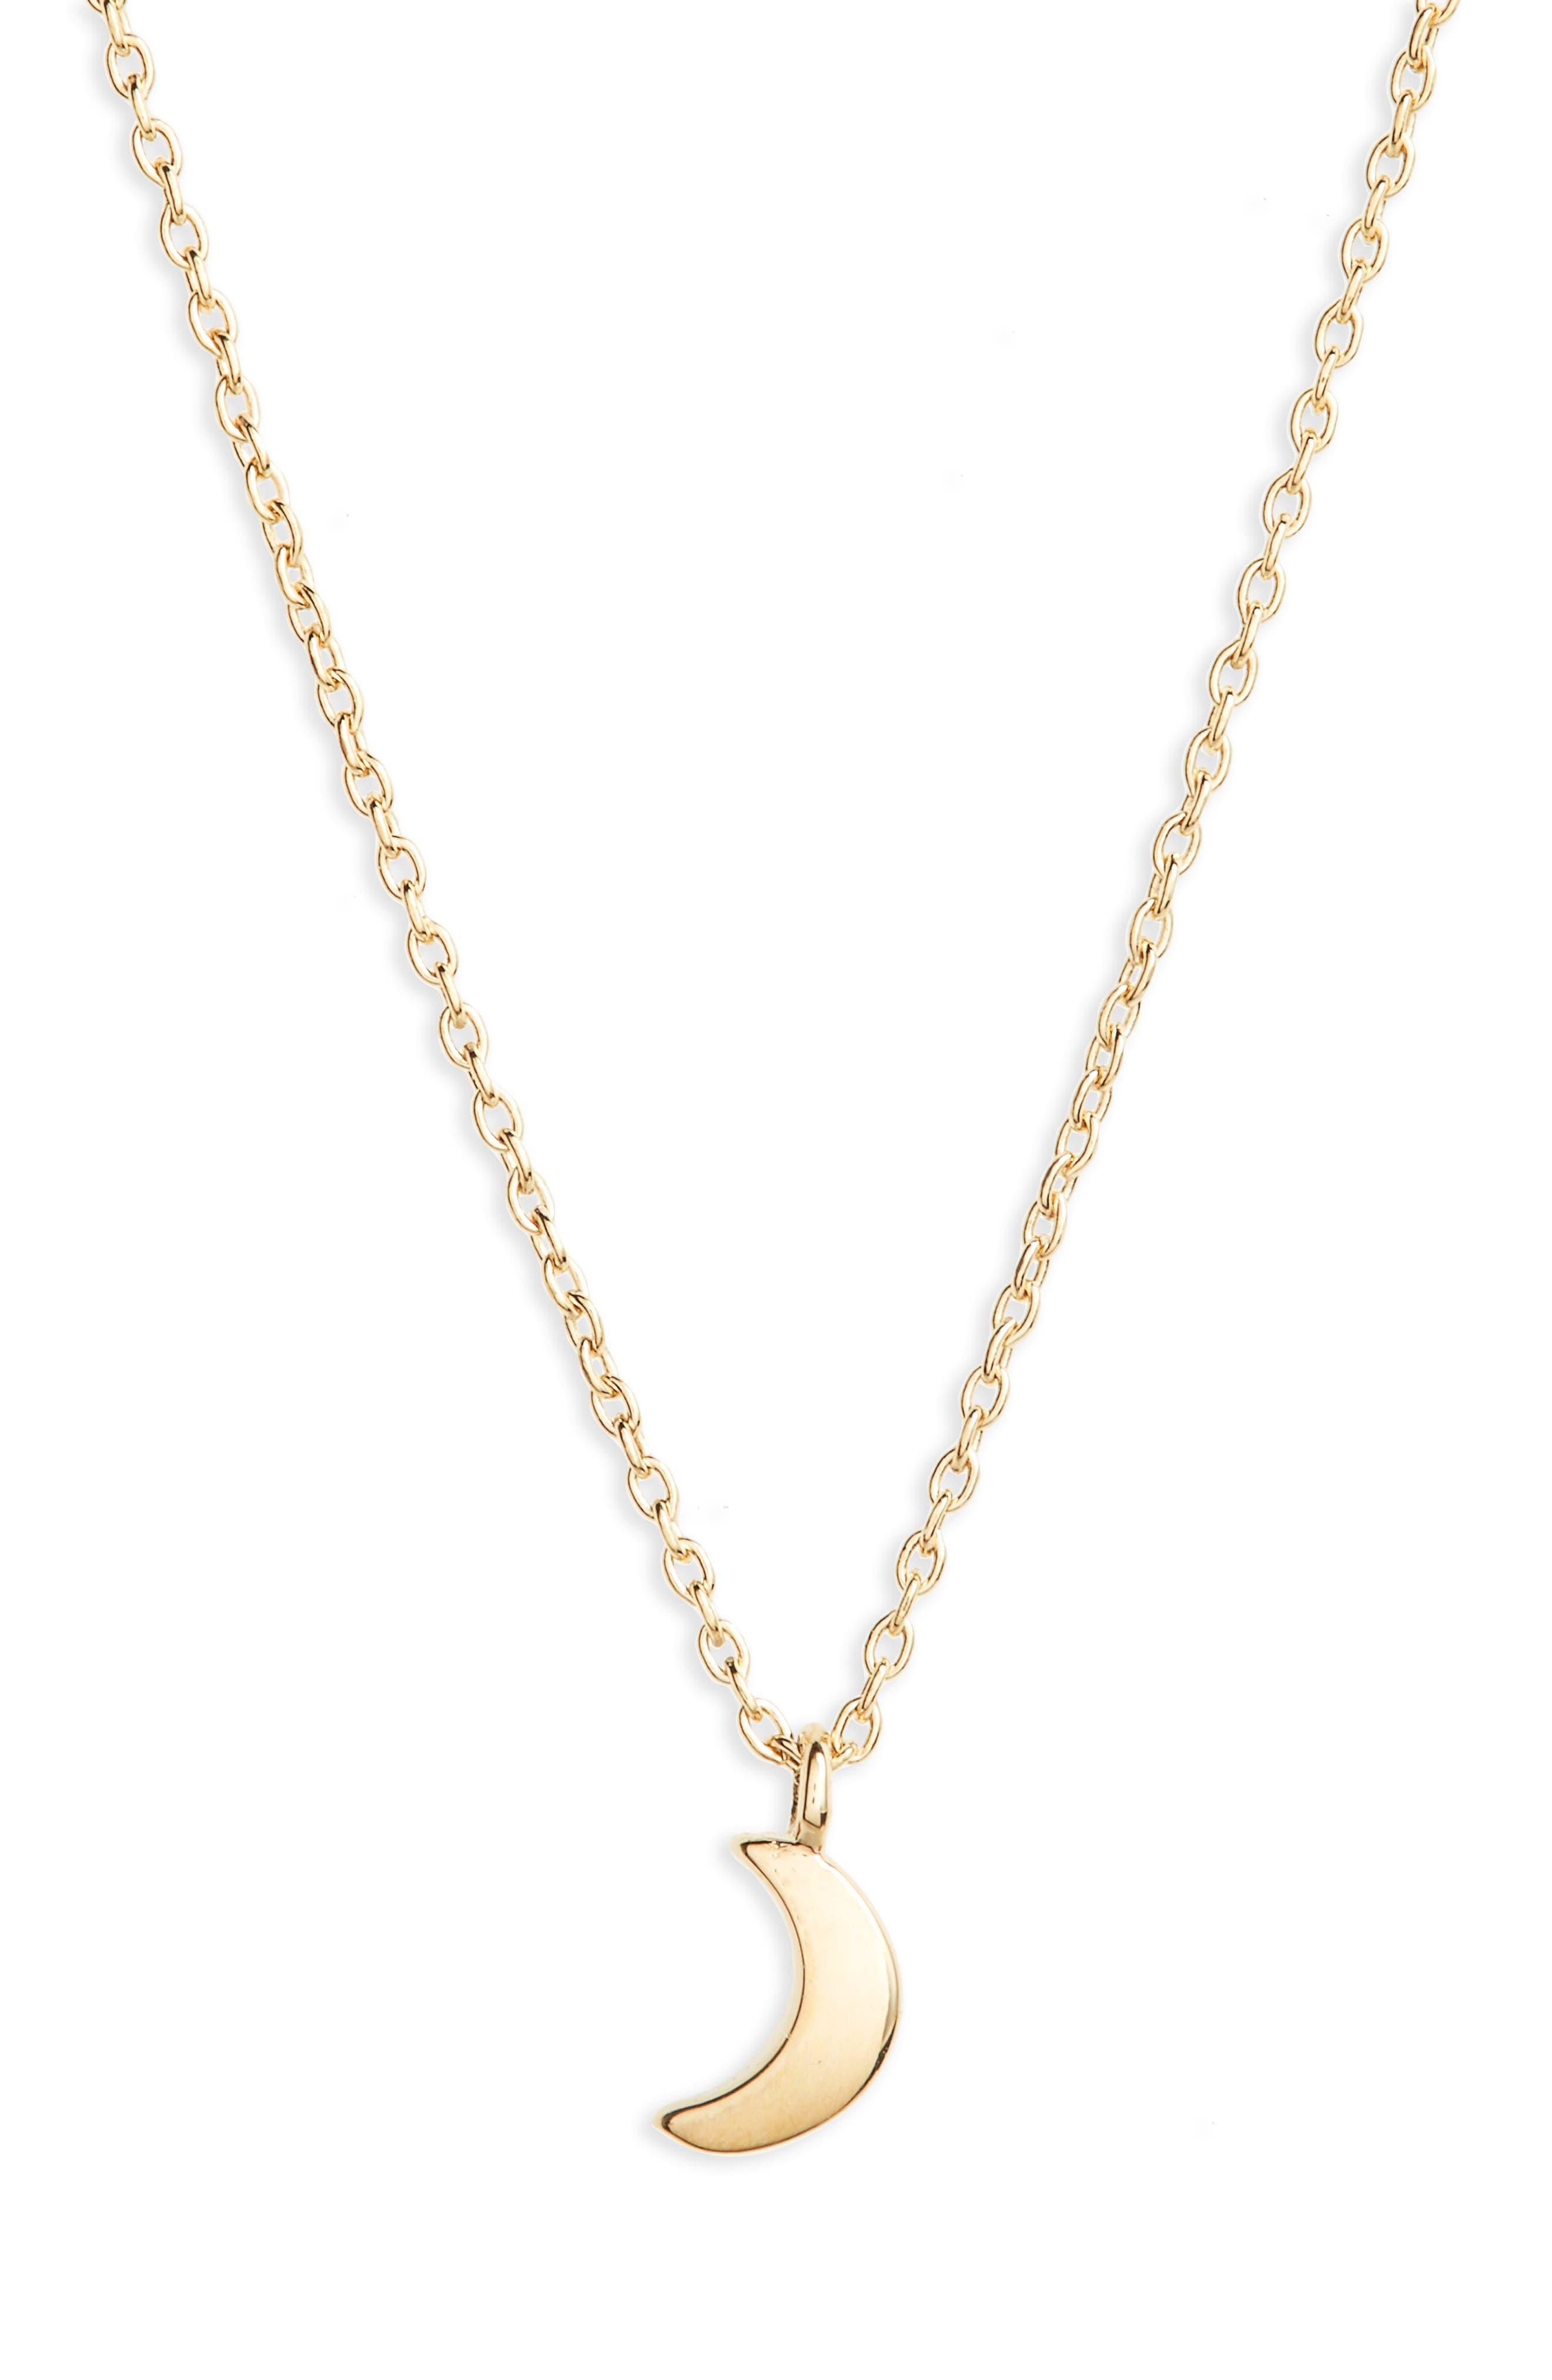 Main Image - Shinola Crescent Moon Charm Necklace